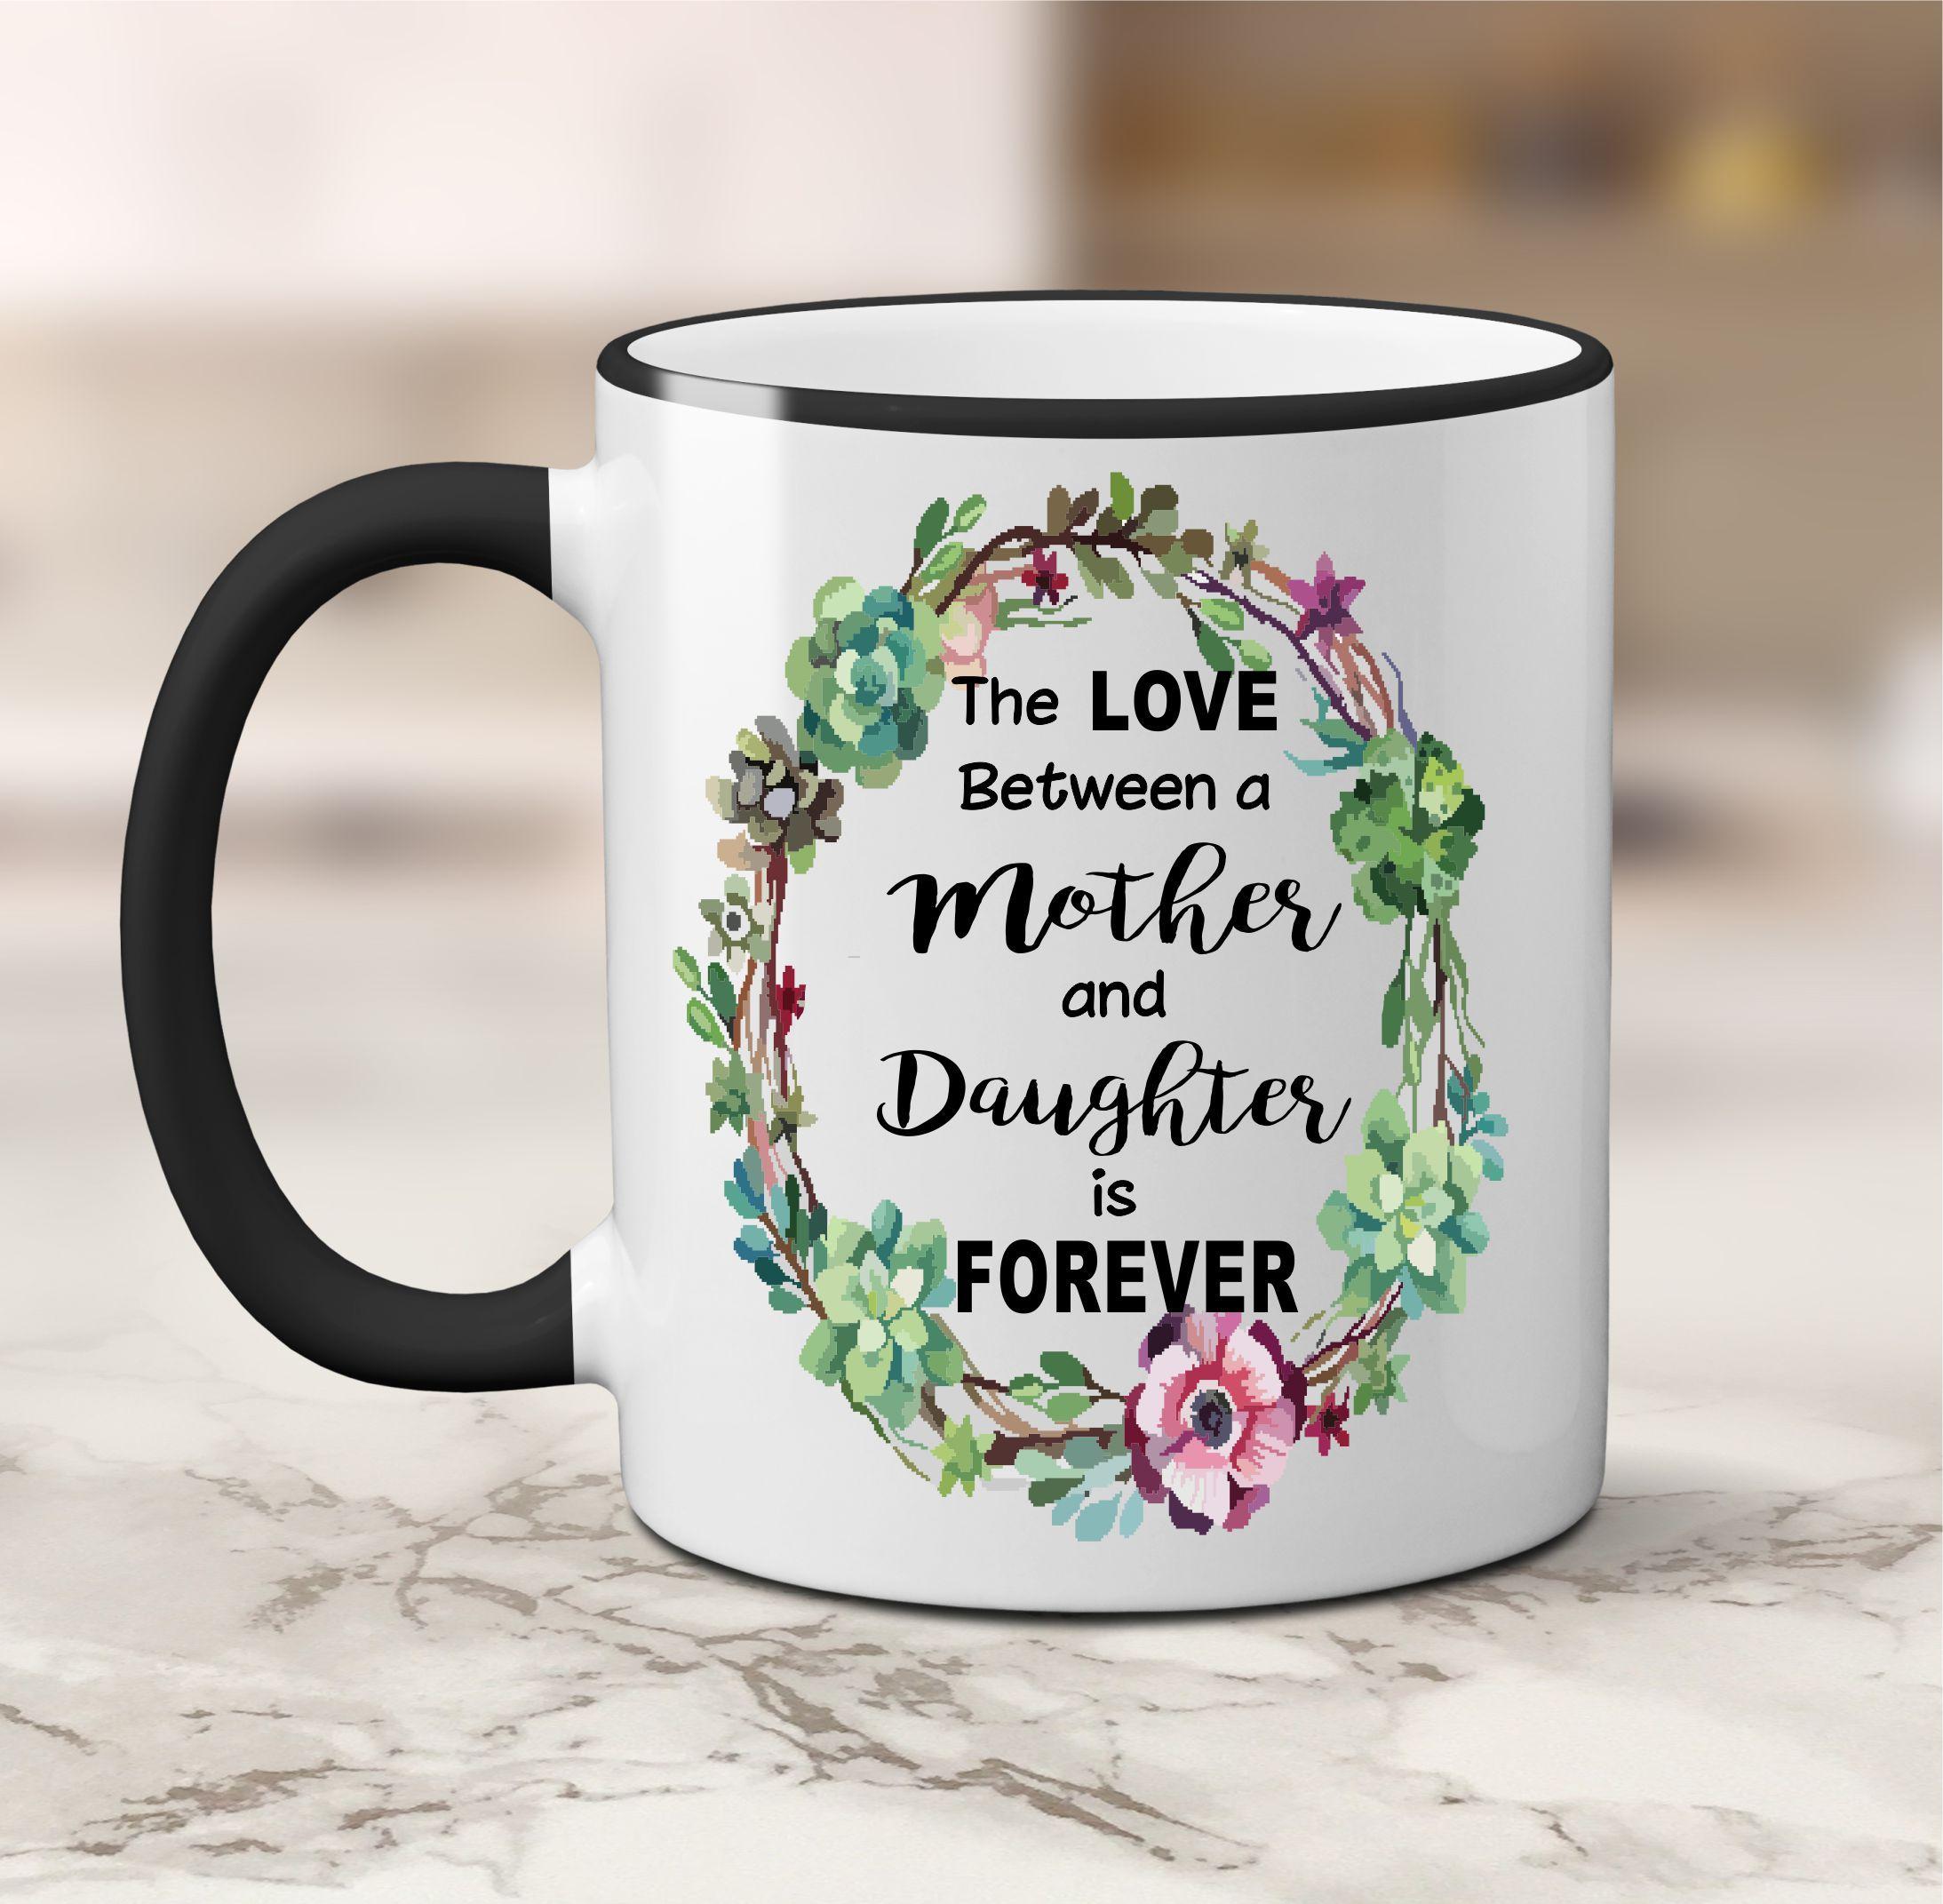 Mom mug daughter mug the love between a mother and